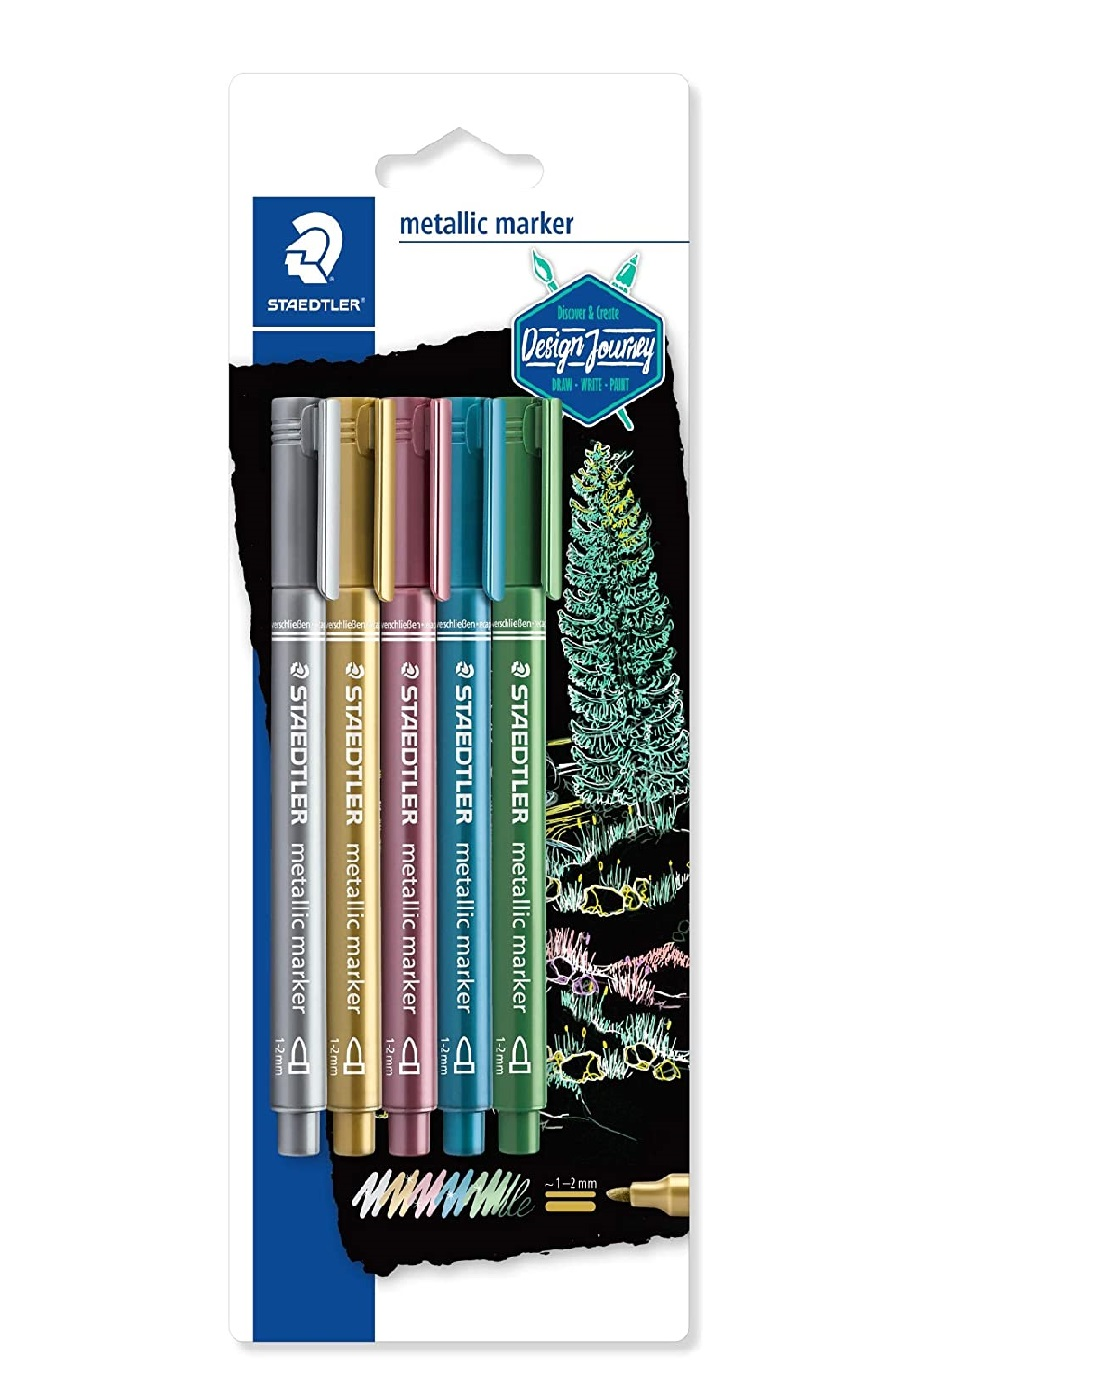 Staedtler 8323-SBK5 5-Shade Metallic Marker